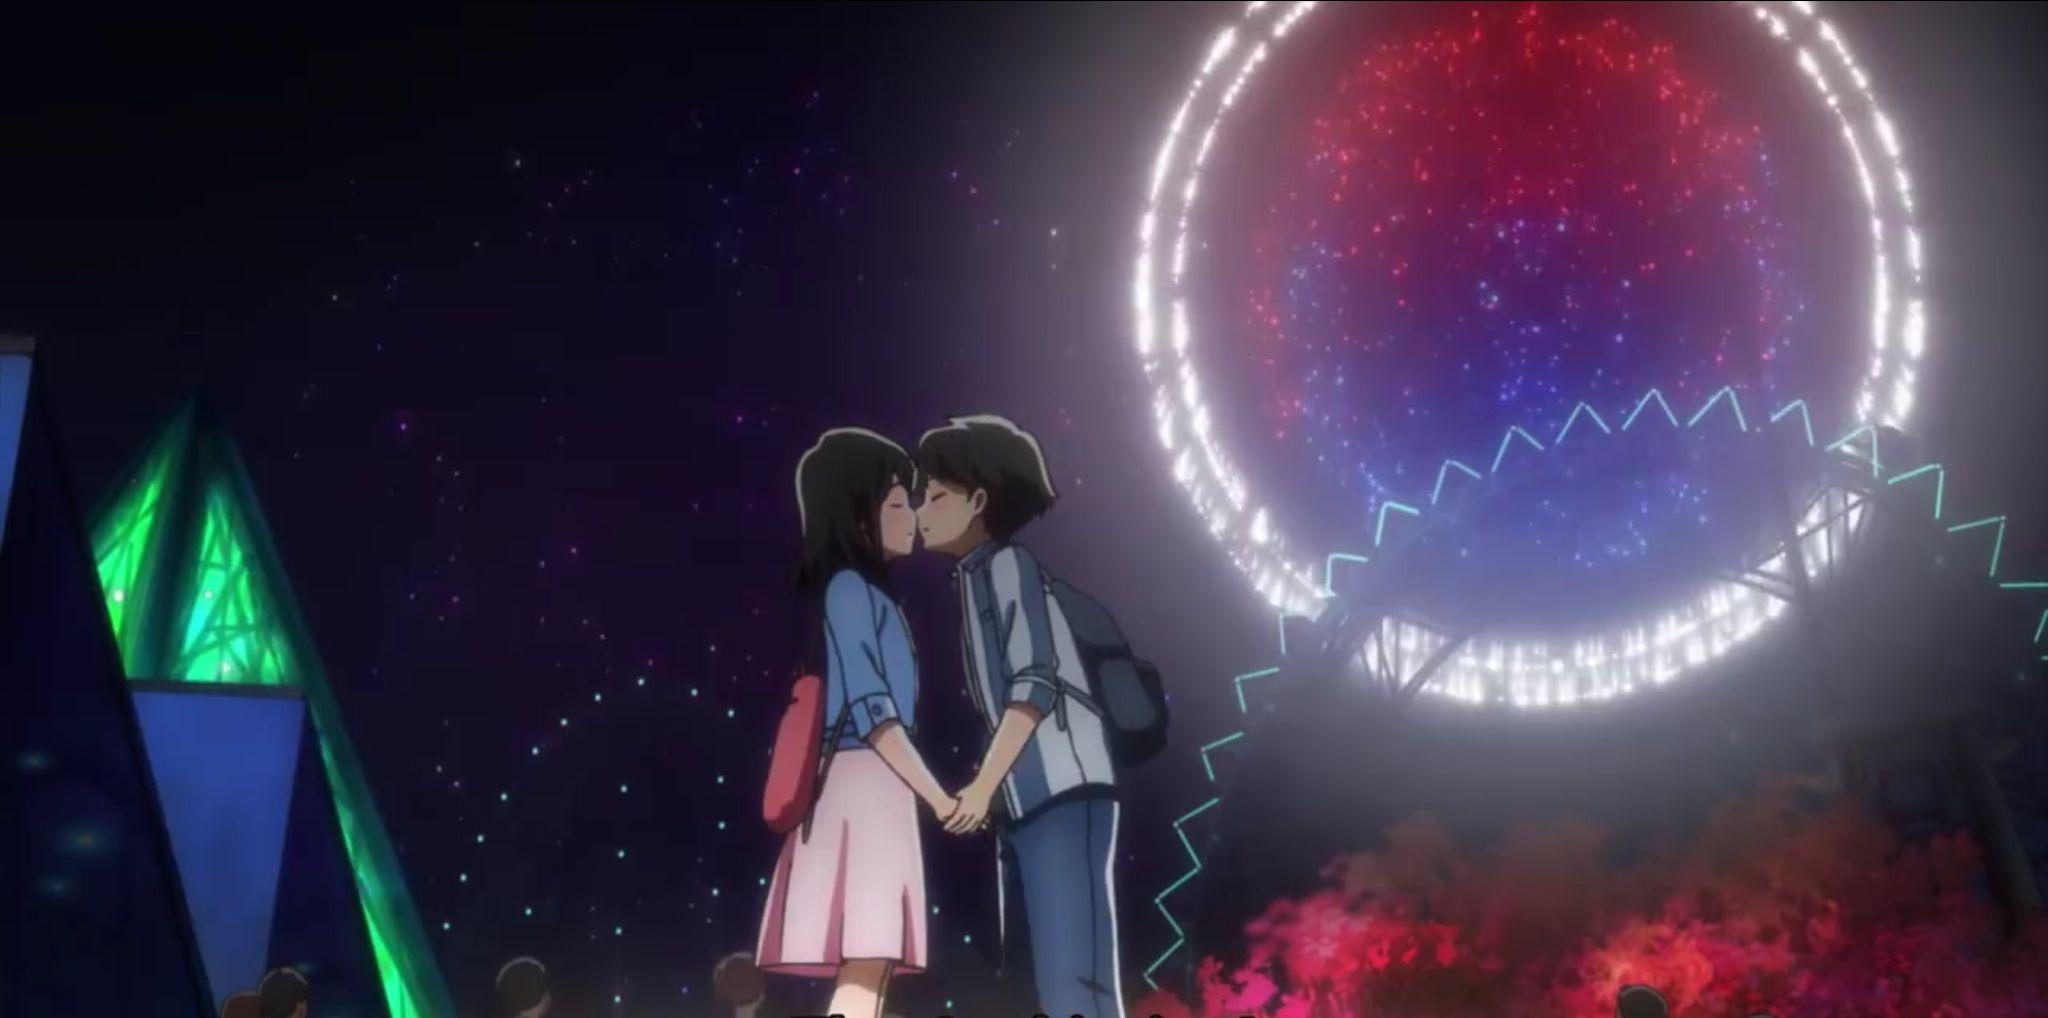 Anime Tsuki ga kirei Anime characters, Anime, Fan art